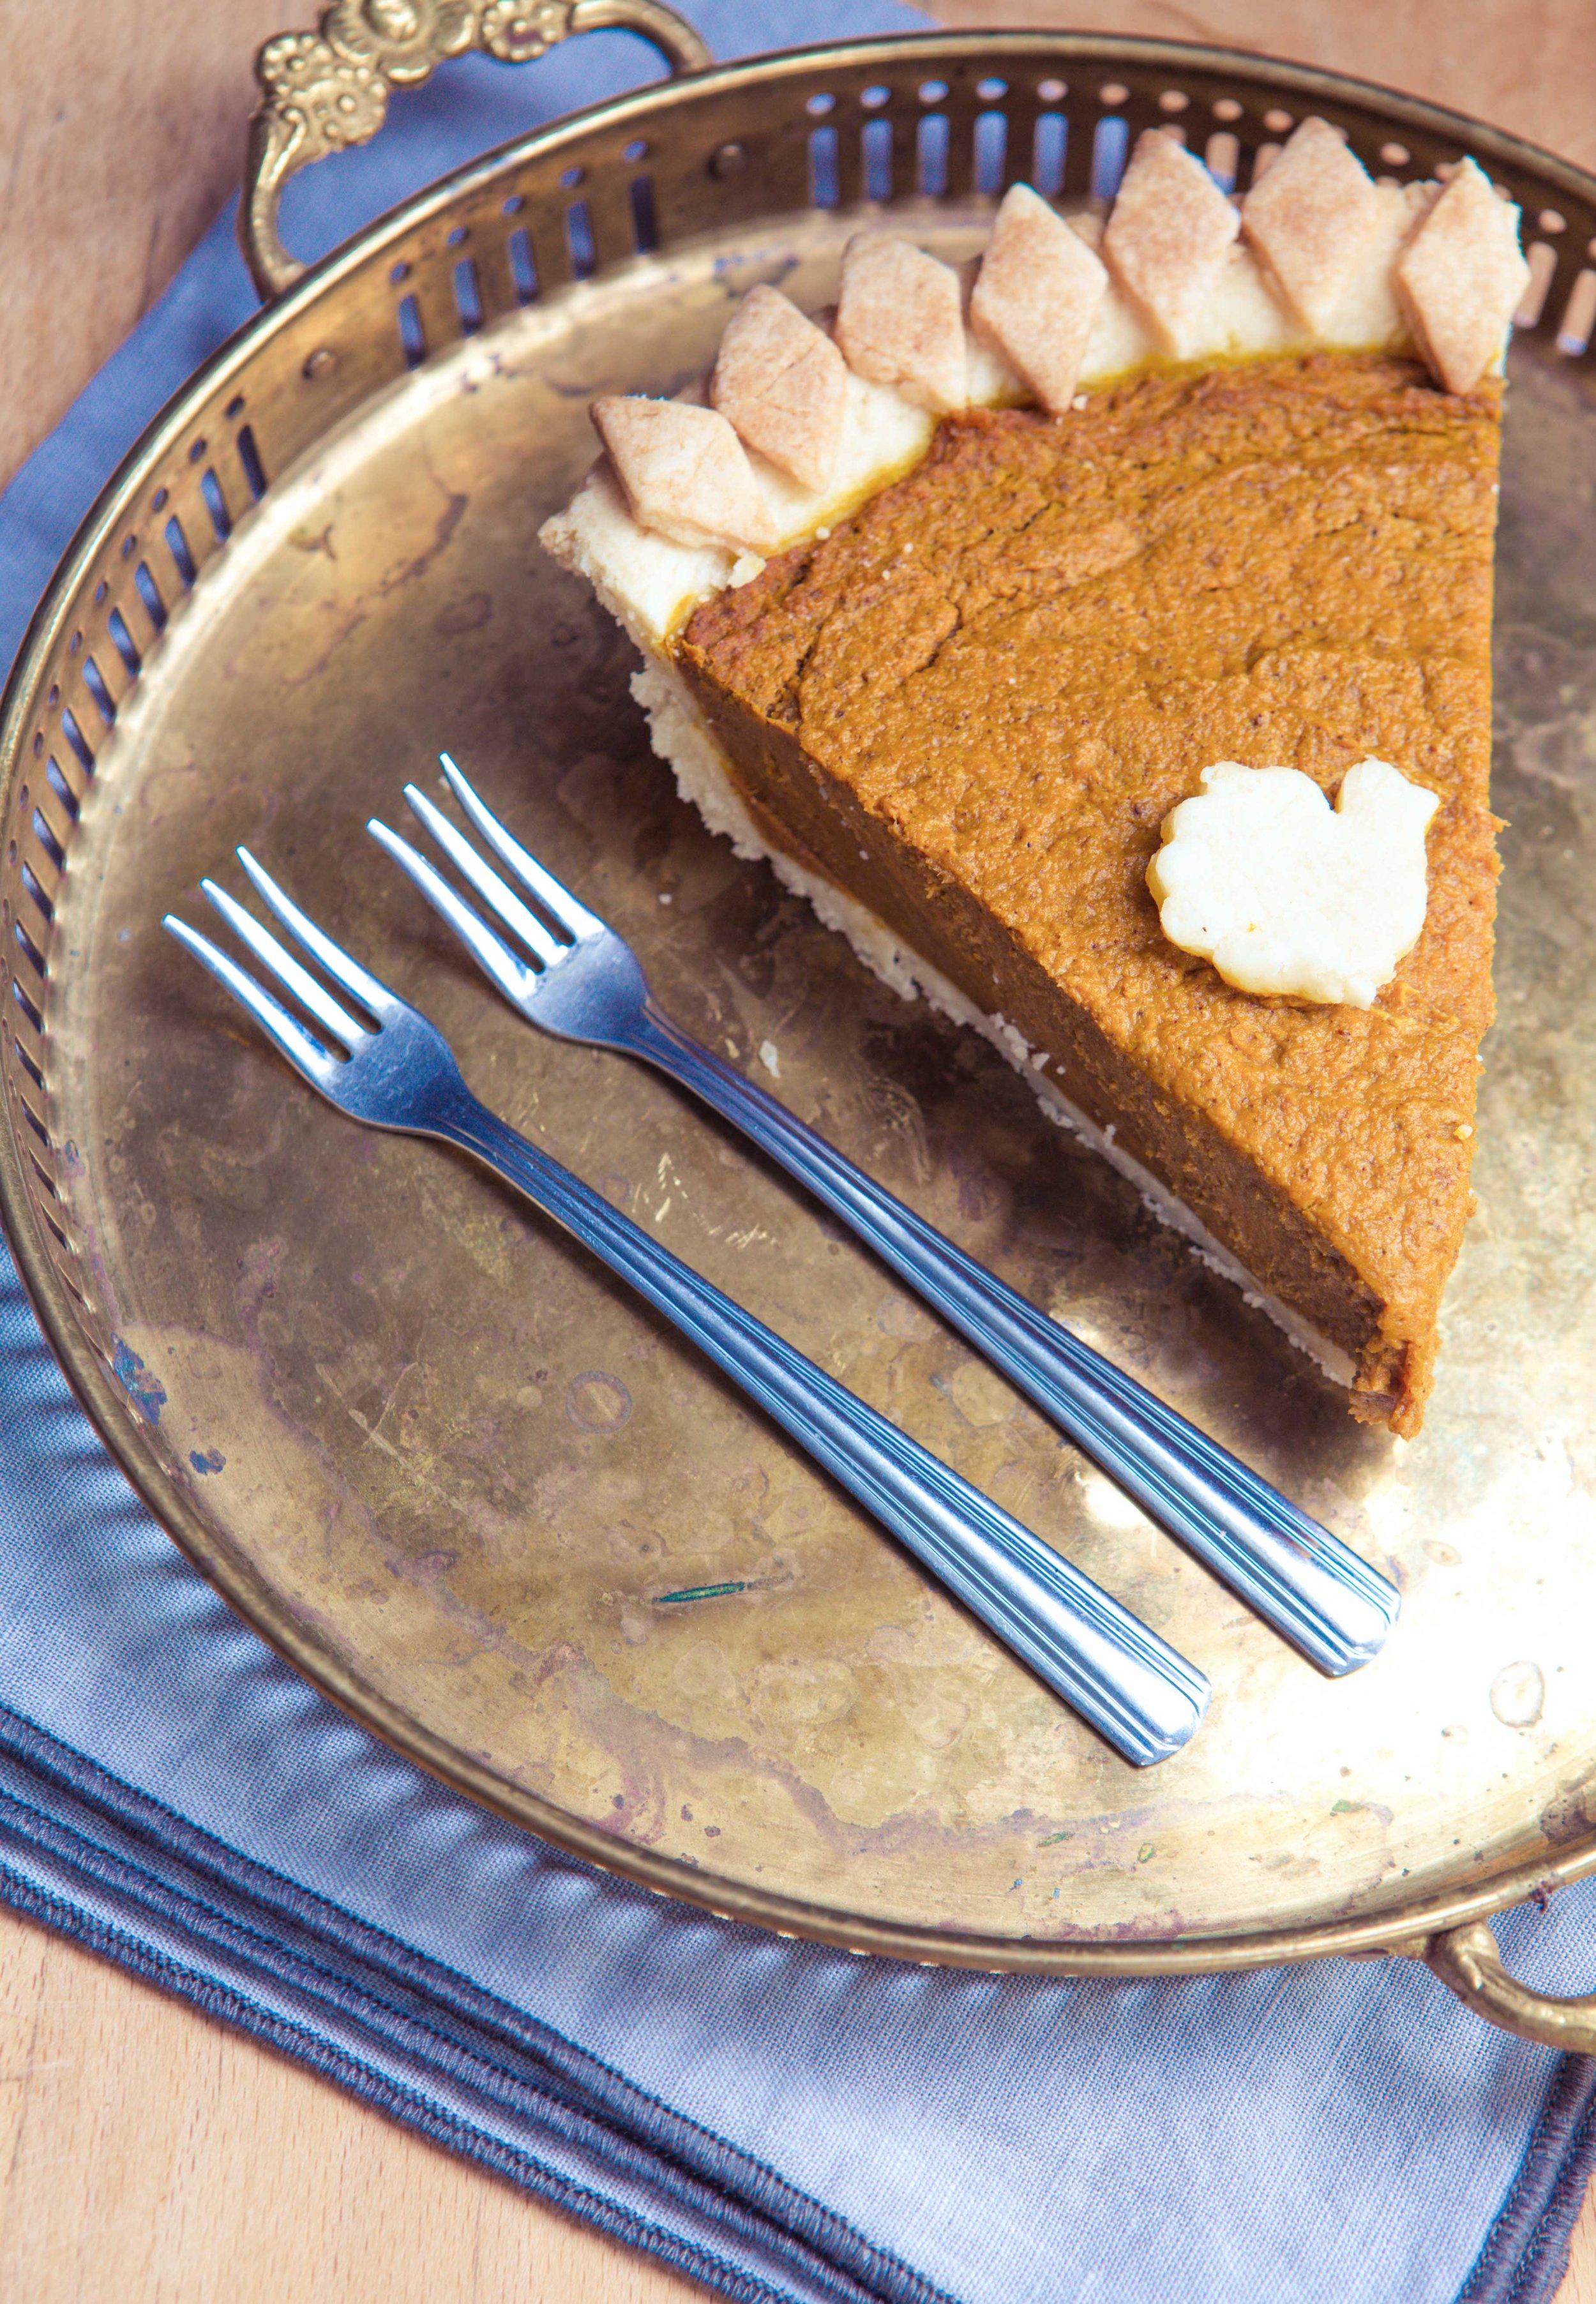 slice of pumpkin pie.jpg